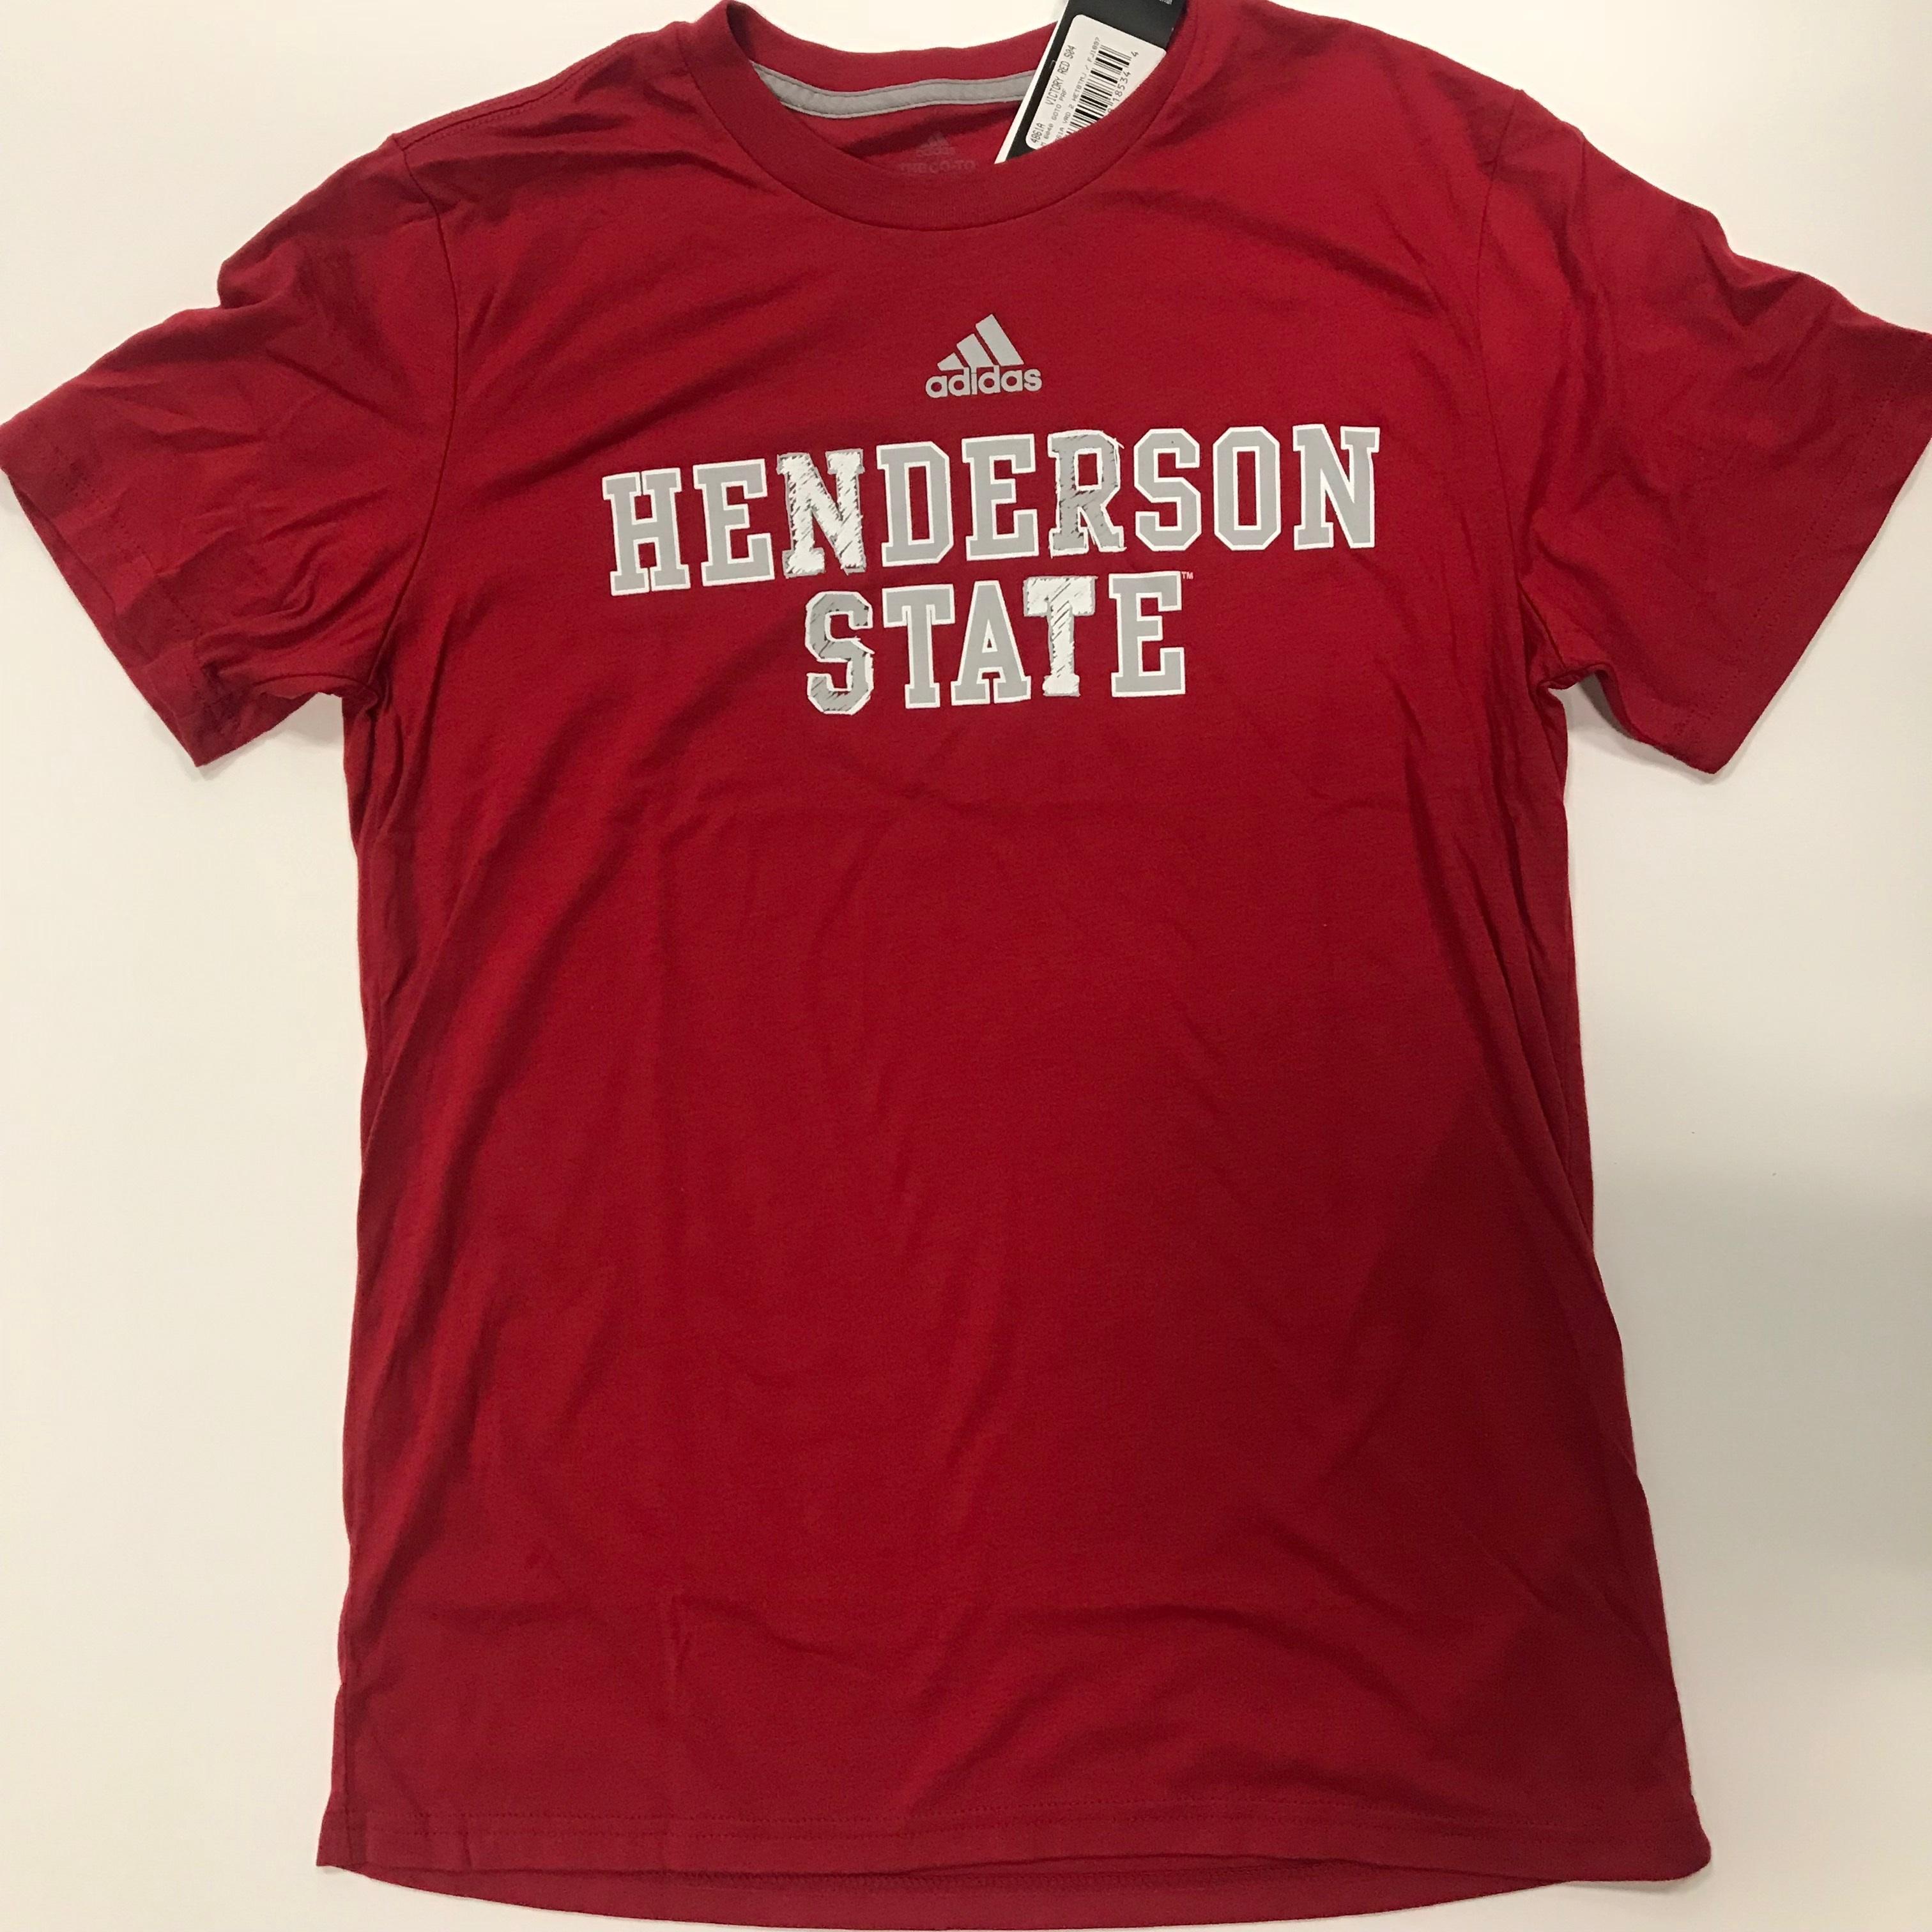 Adidas Henderson State Victory Tee